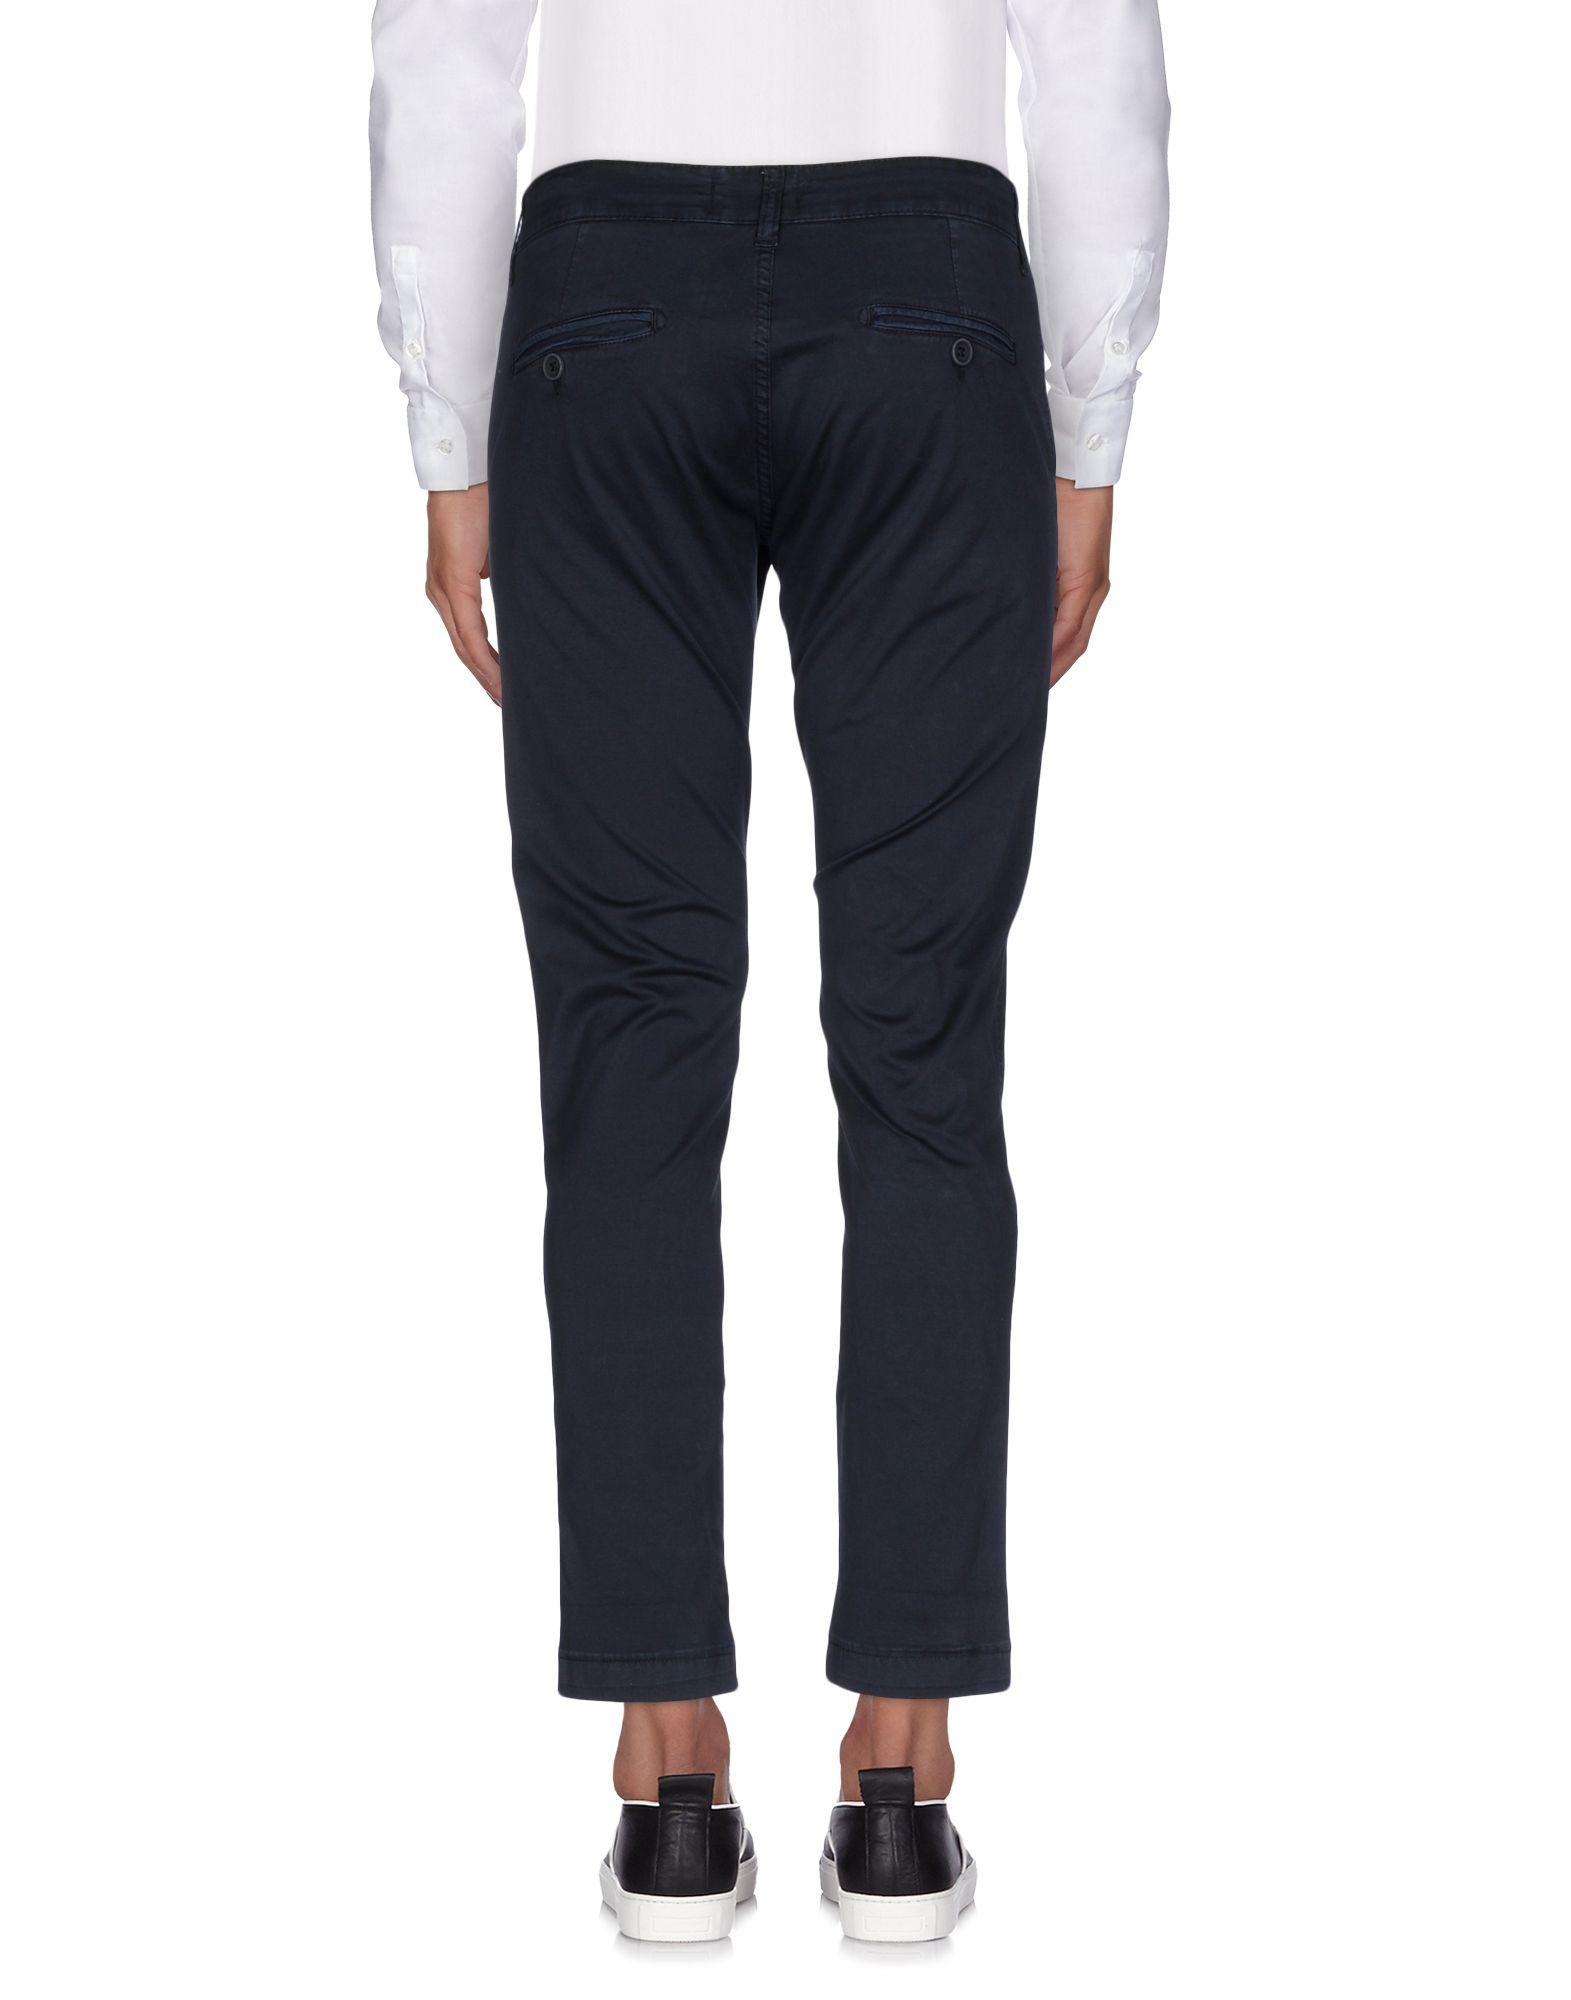 Exibit Cotton Casual Pants in Dark Blue (Blue) for Men